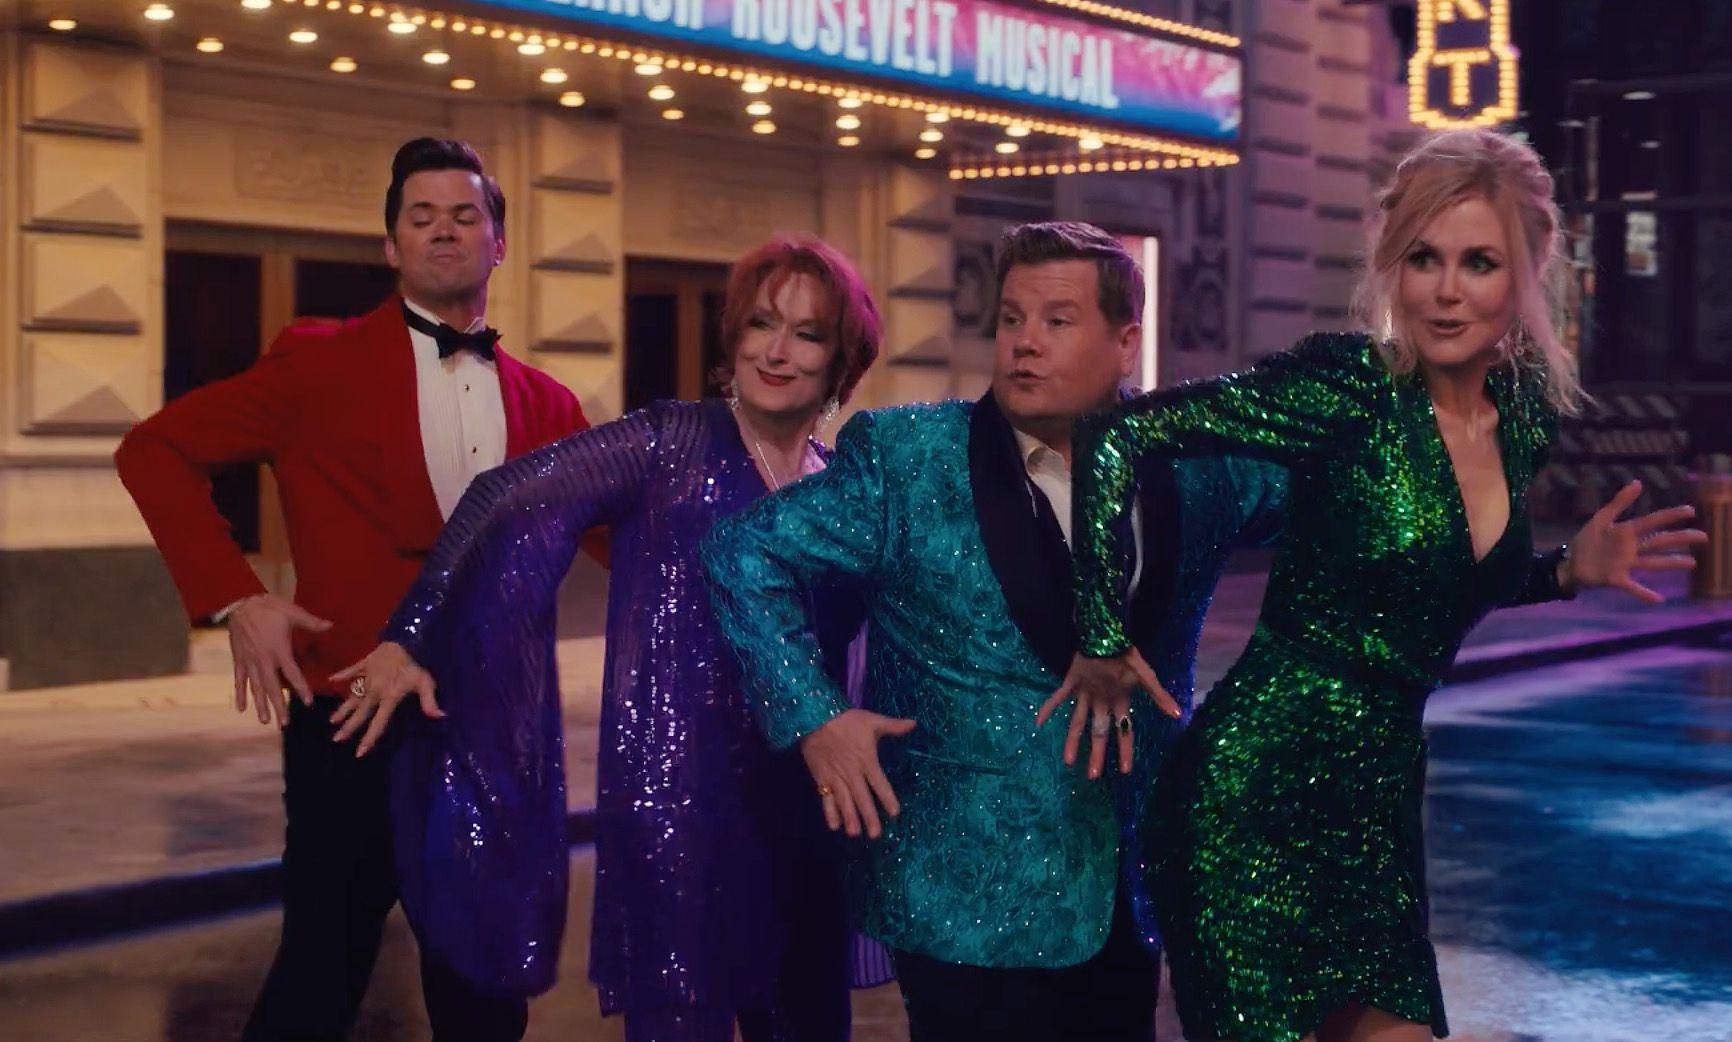 """The Prom"": dal musical di Broadway a Netflix, i diritti LGBT sono serviti in chiave spettacolare"